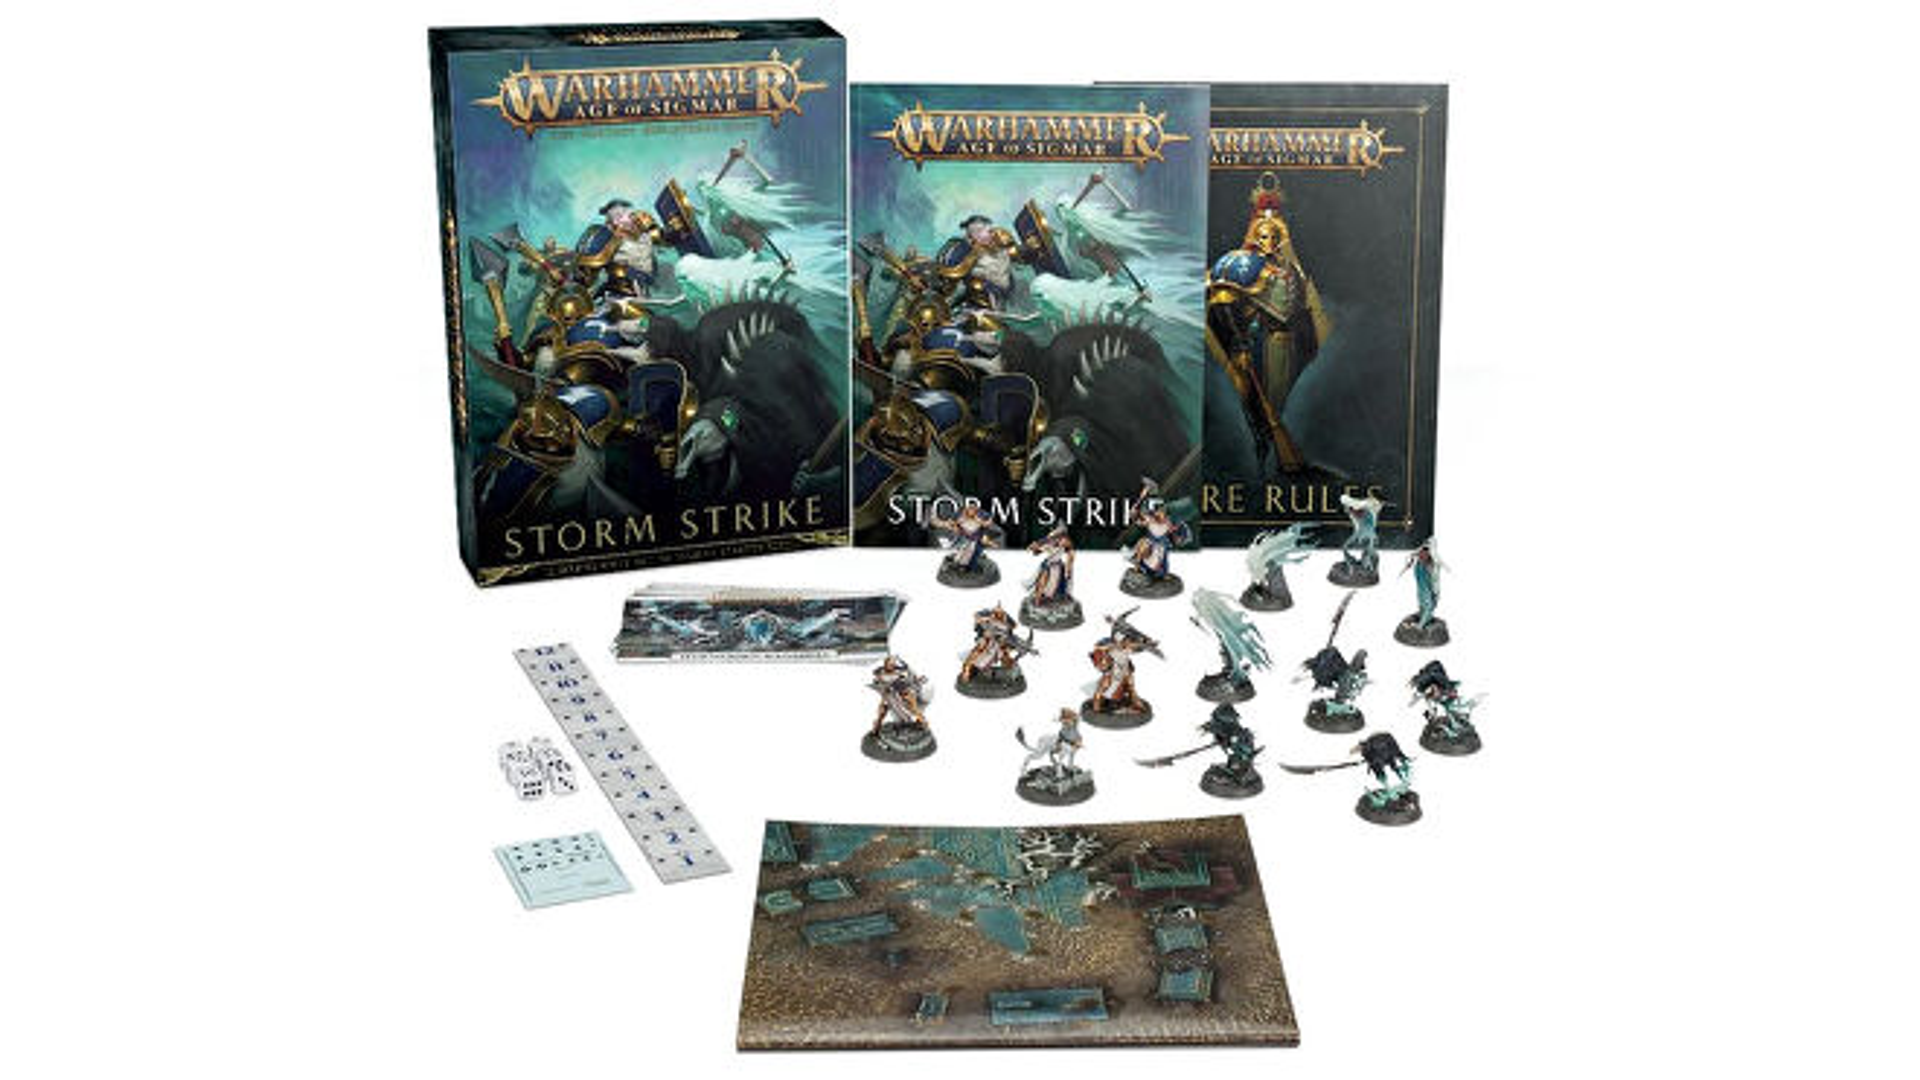 warhammer-age-of-sigmar-storm-strike-box-set.jpg